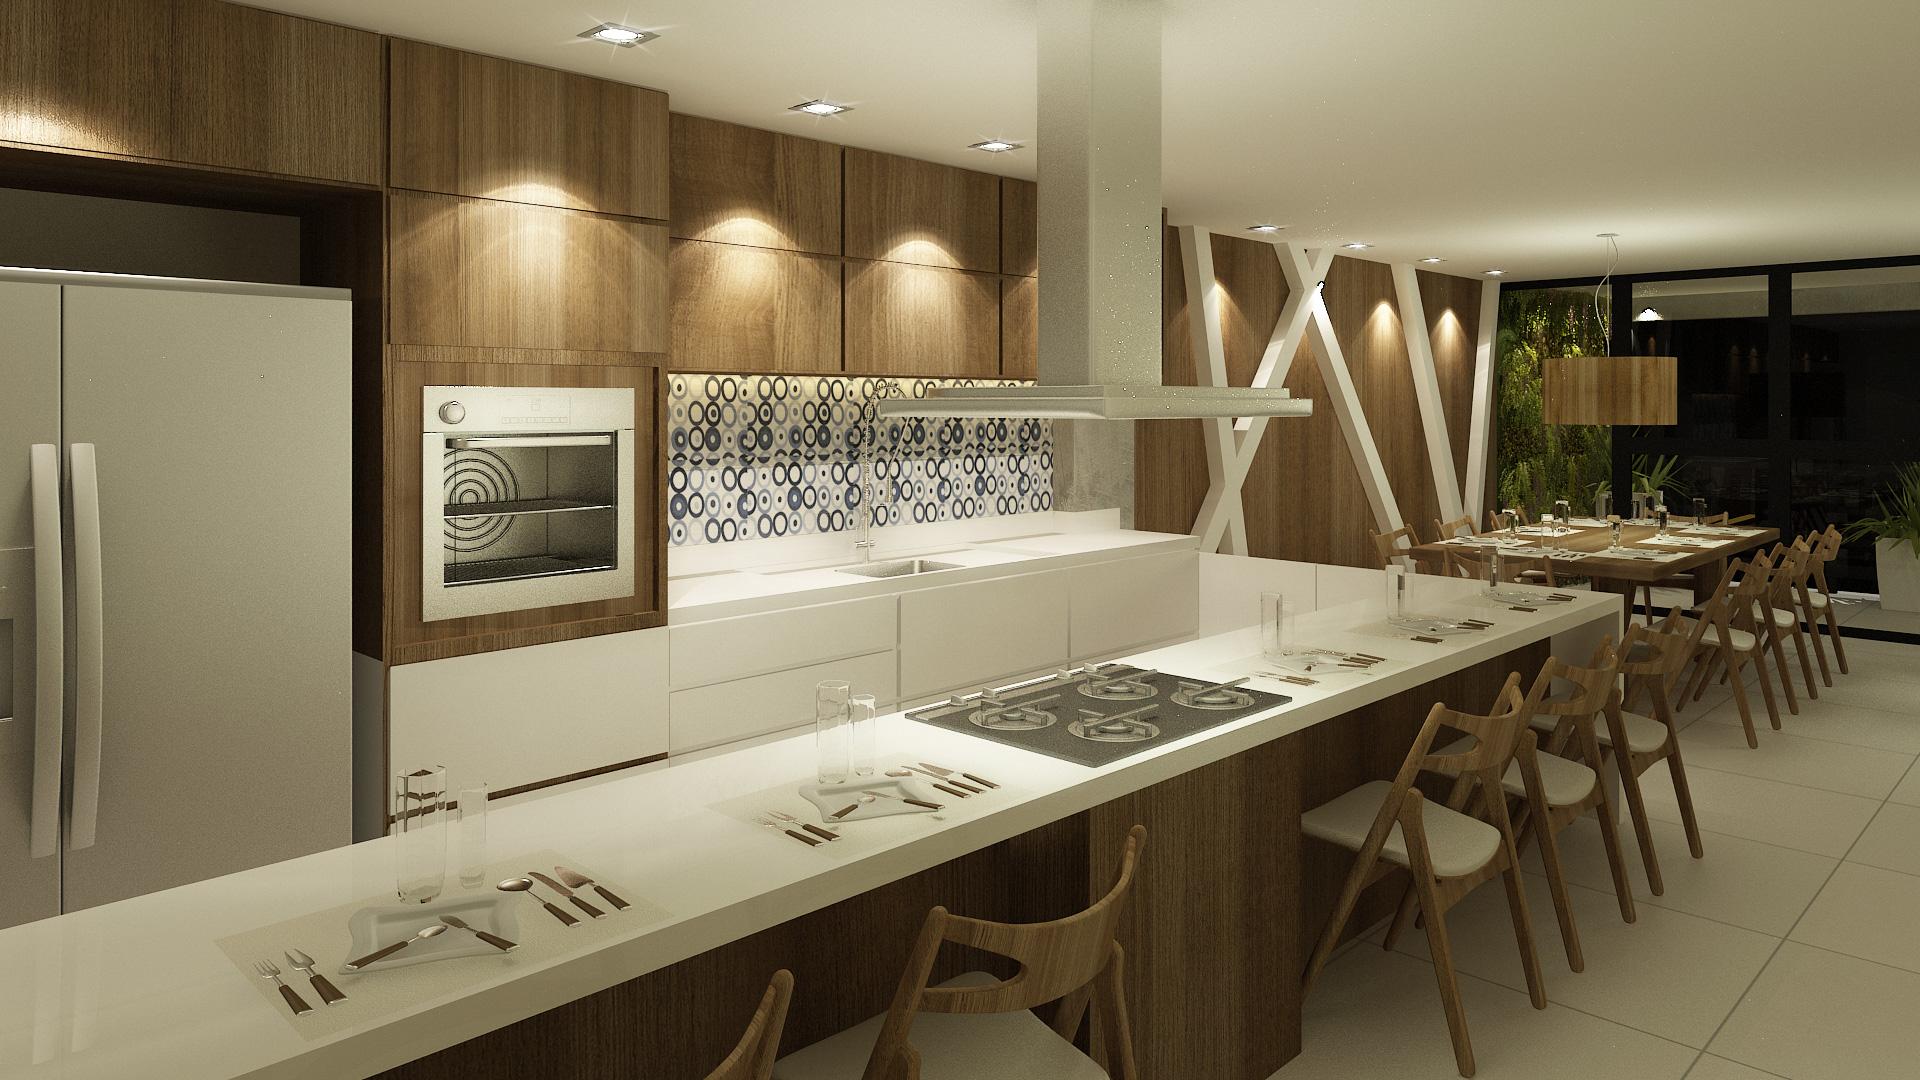 01-area-comum-pamplona-santos-mazzark-arquitetos-design-interiores-salao-festa